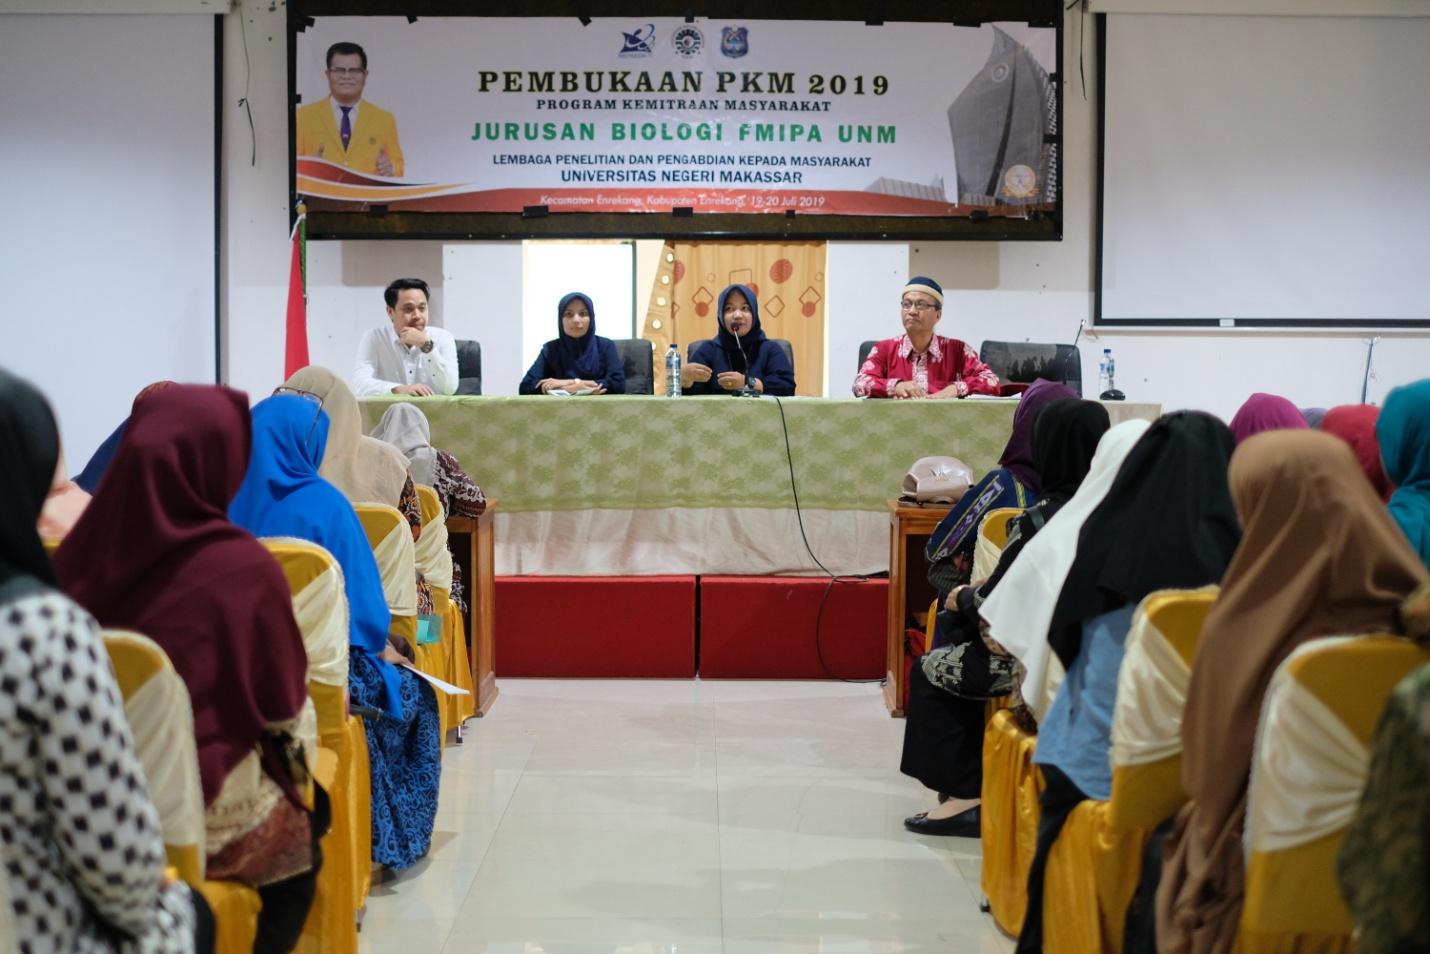 Pembukaan kegiatan pengabdian kepada masyarakat terpadu jurusan Biologi FMIPA UNM di Kabupaten Enrekang